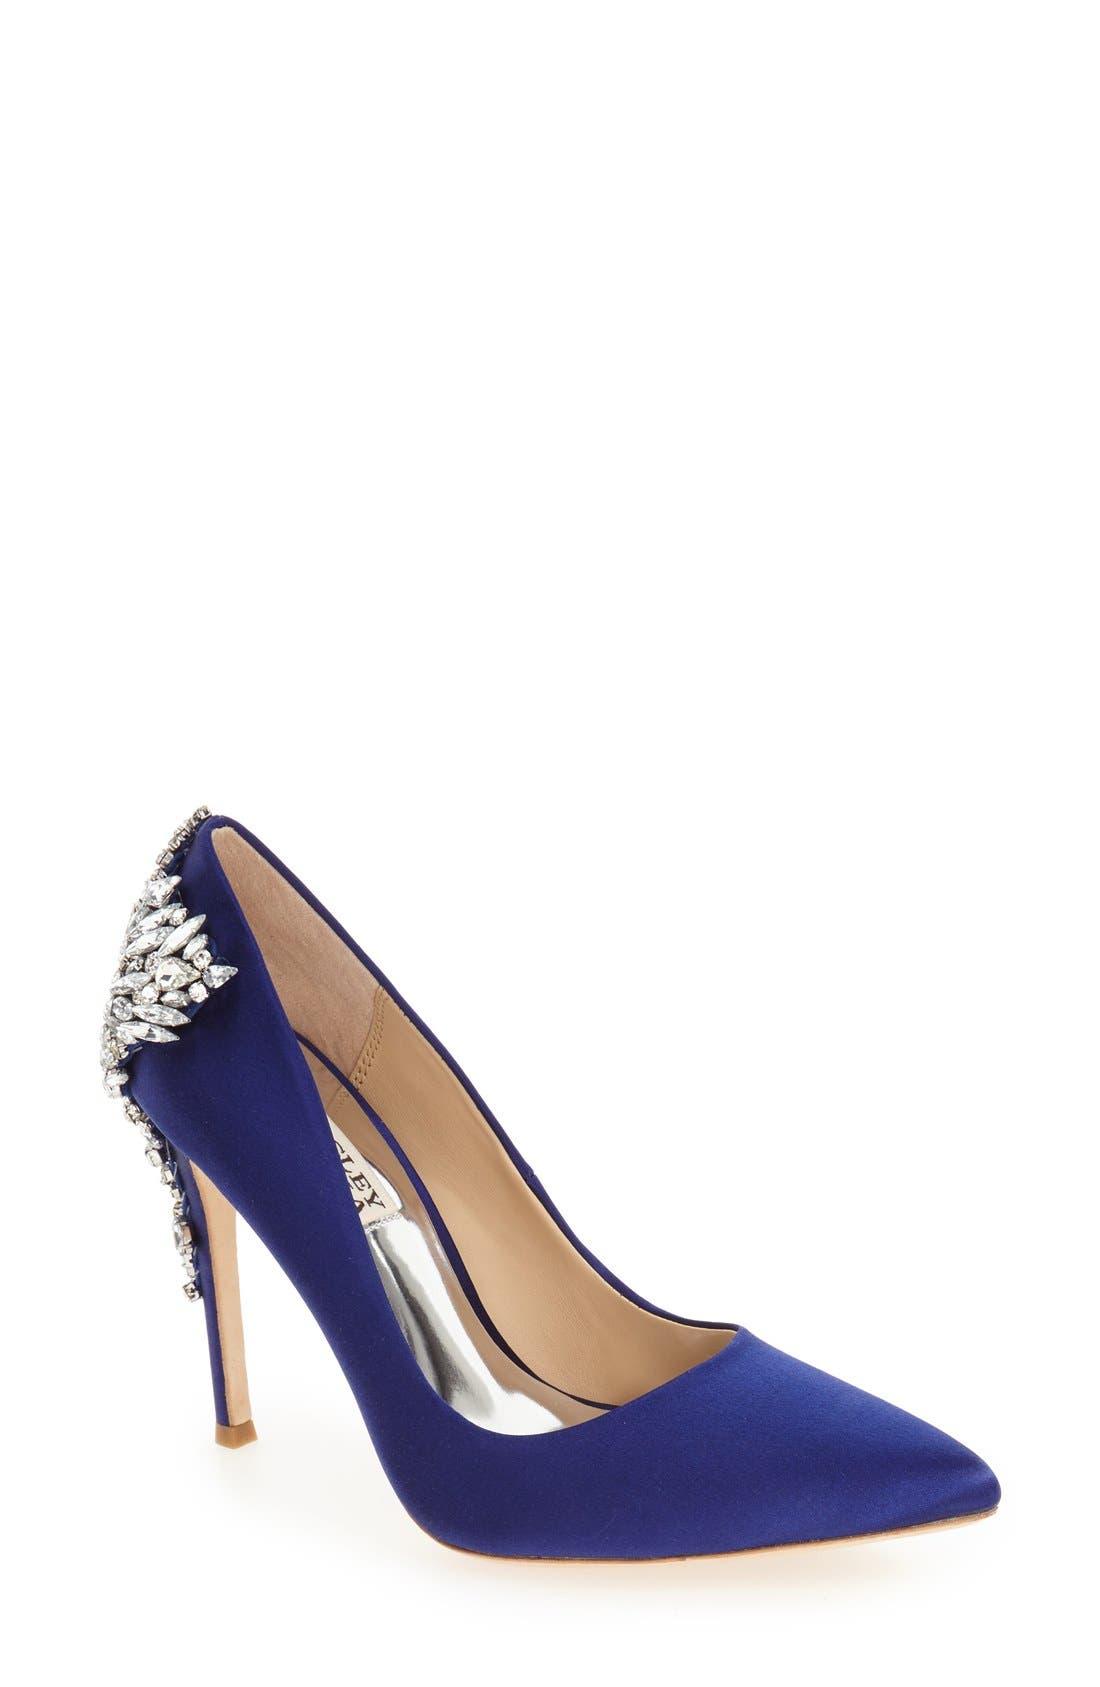 Alternate Image 1 Selected - Badgley Mischka 'Gorgeous' Crystal Embellished Pointy Toe Pump (Women)